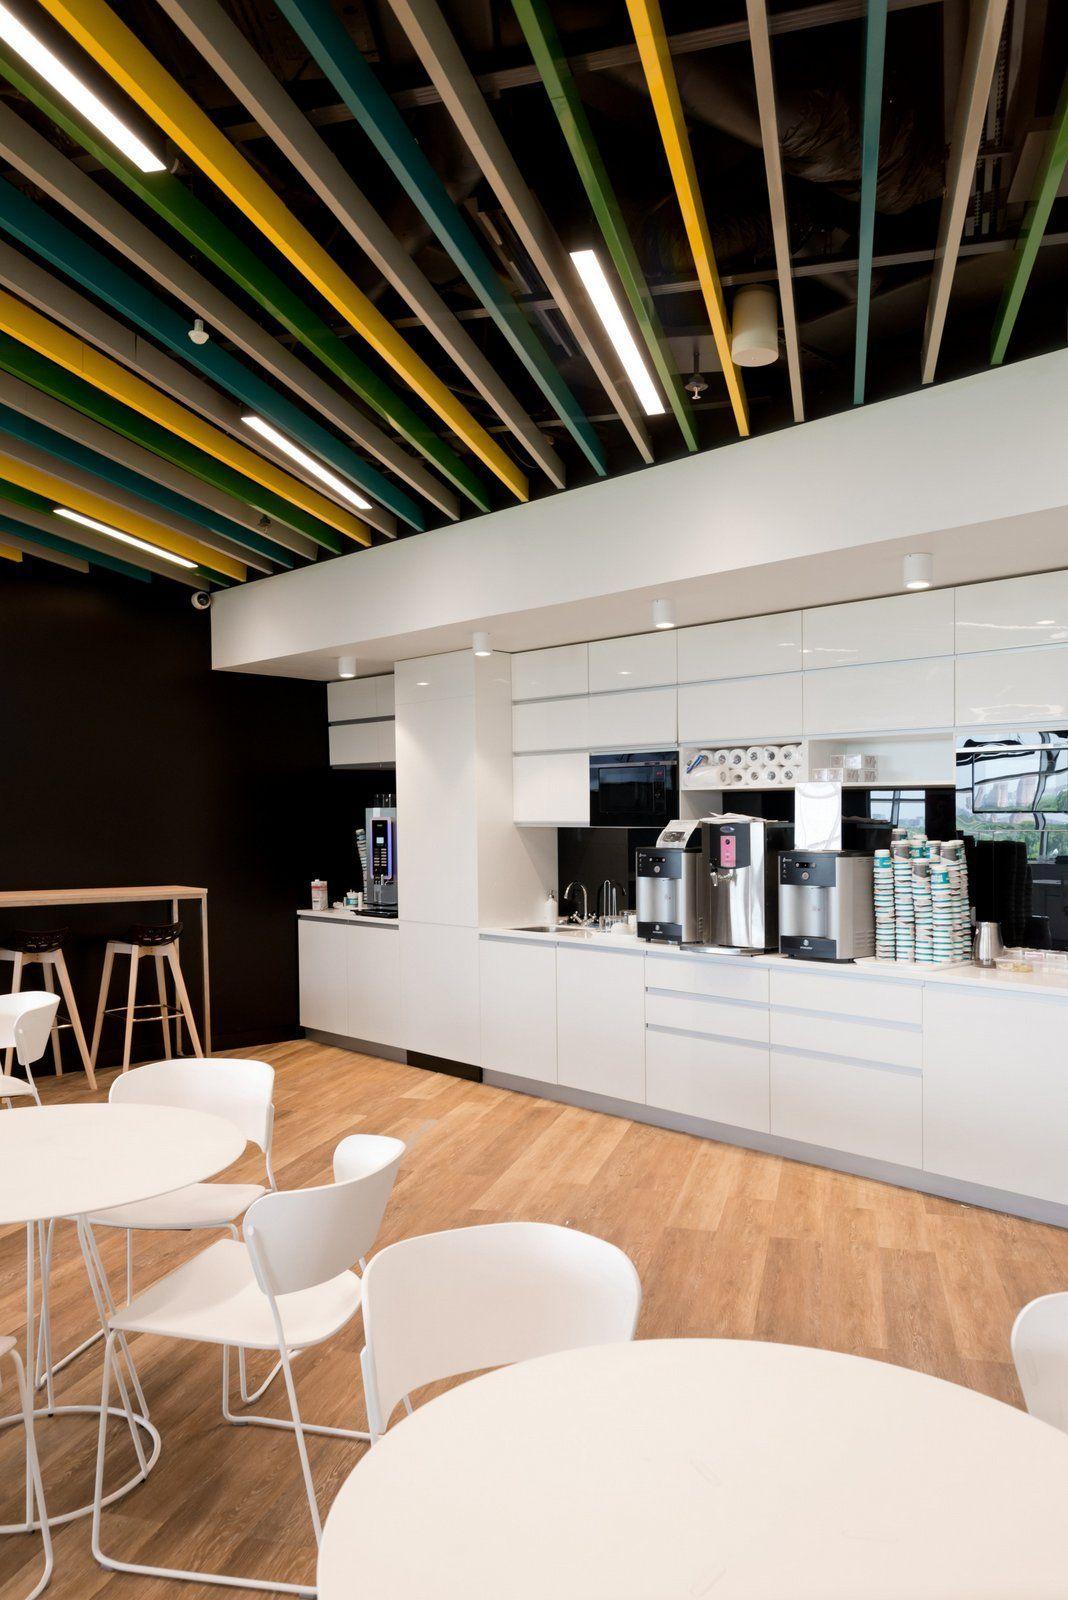 Ebay Office Cafeteria San Jose Office Snapshots Office